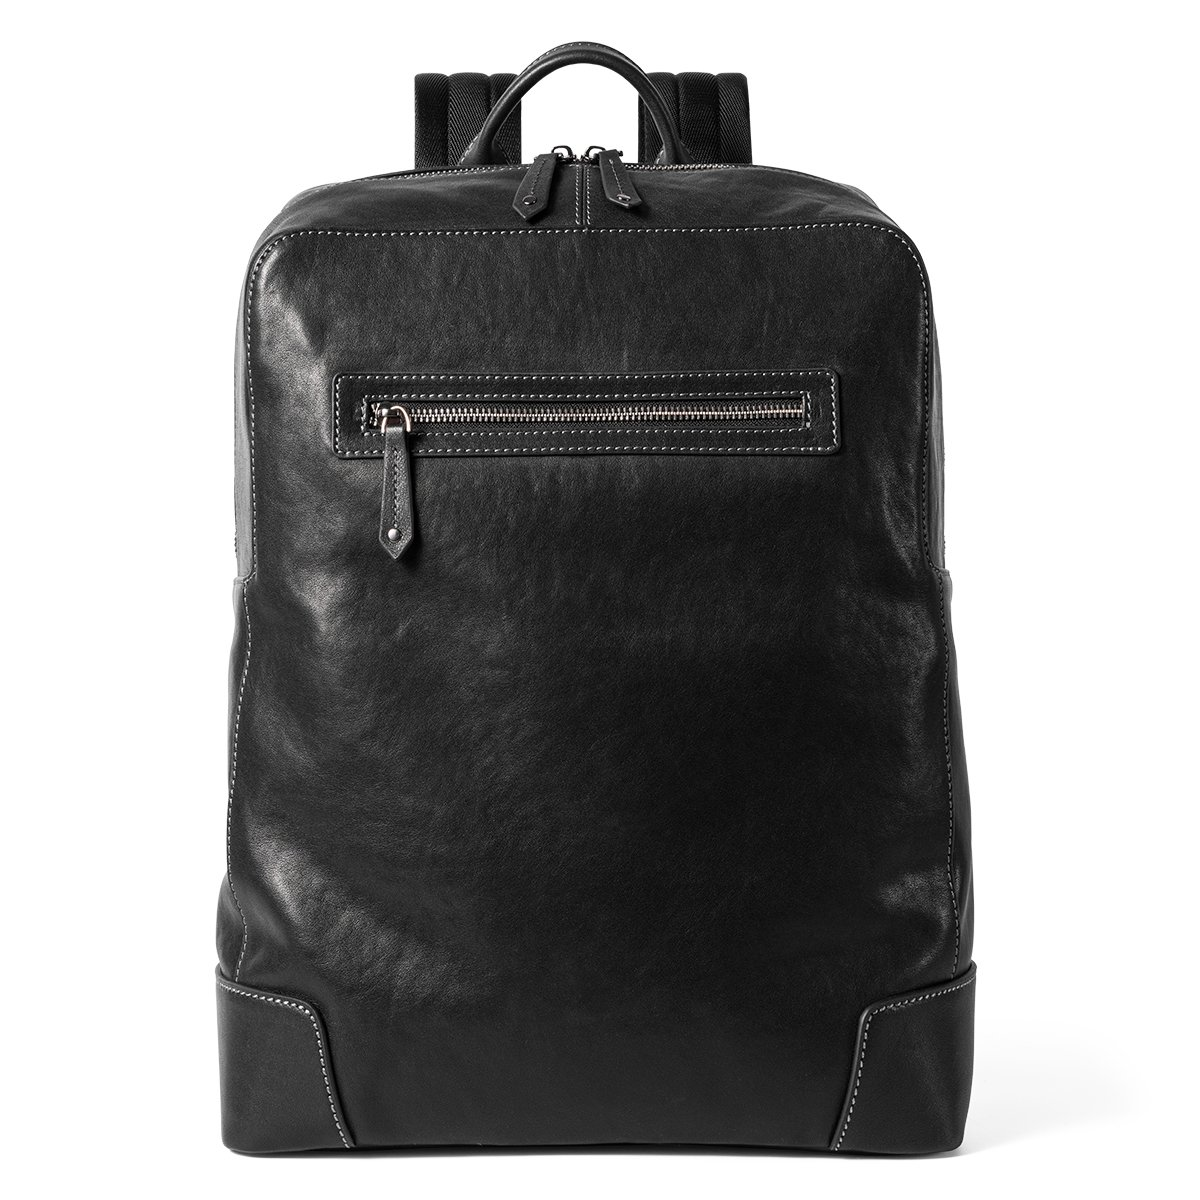 Sharkborough The Signature Entrepreneur Mens Backpack Genuine Leather for Casual Daypacks